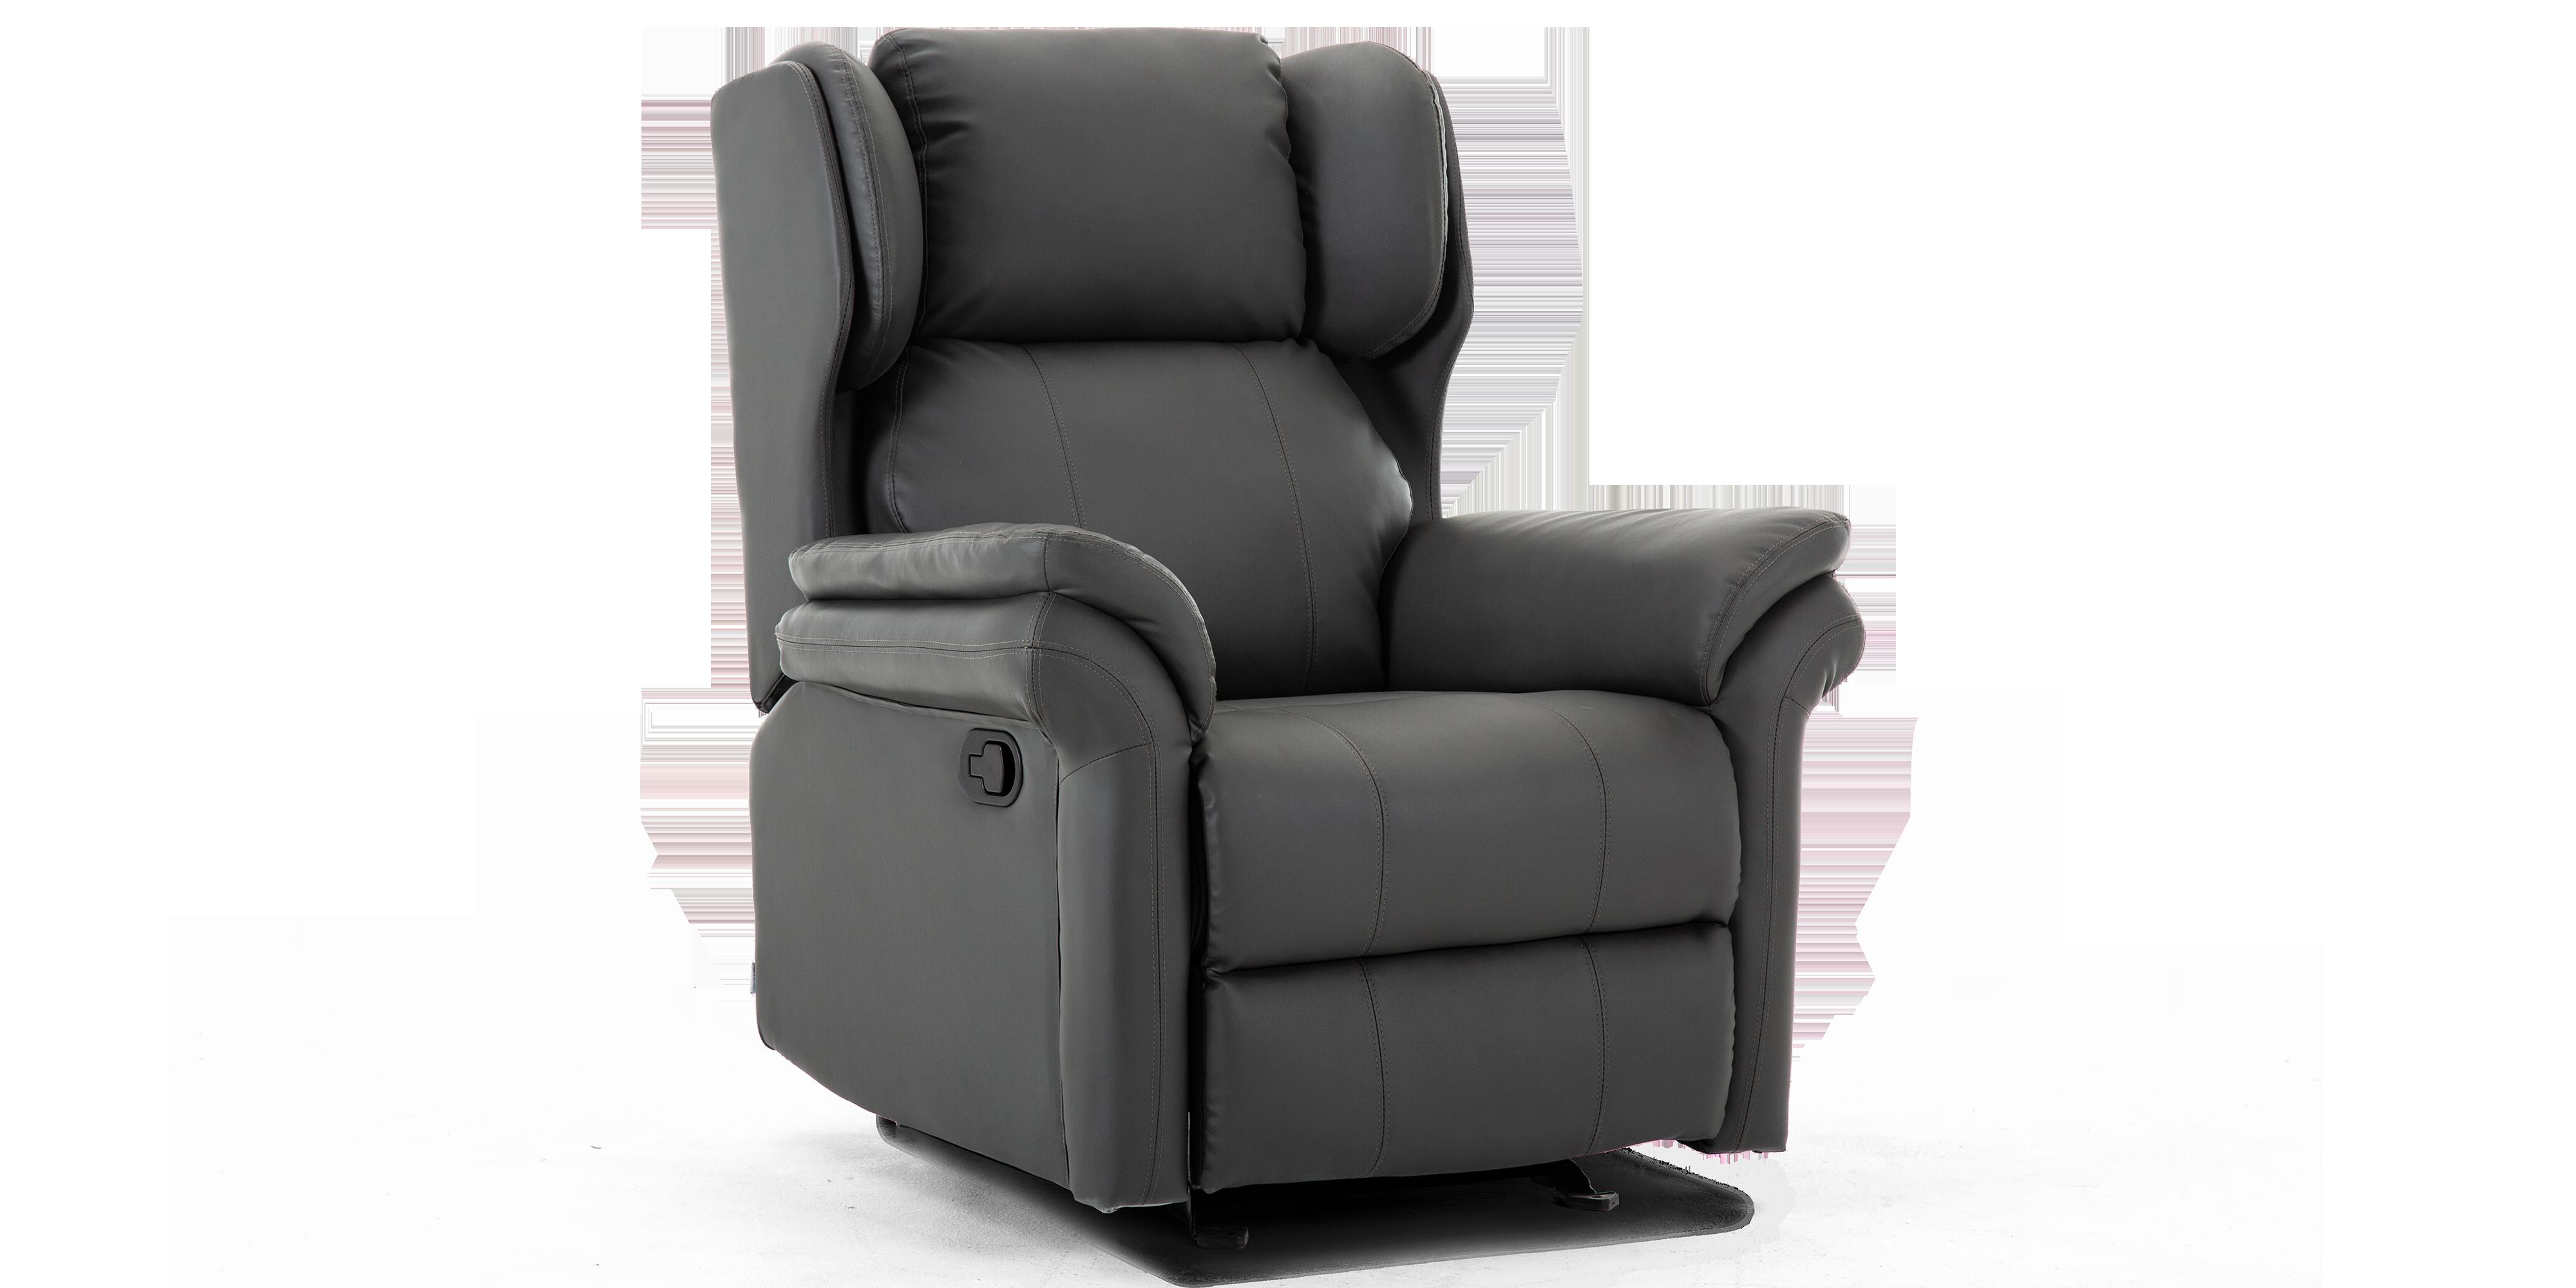 Oakley Leather Manual Recliner Chair In Slate Grey